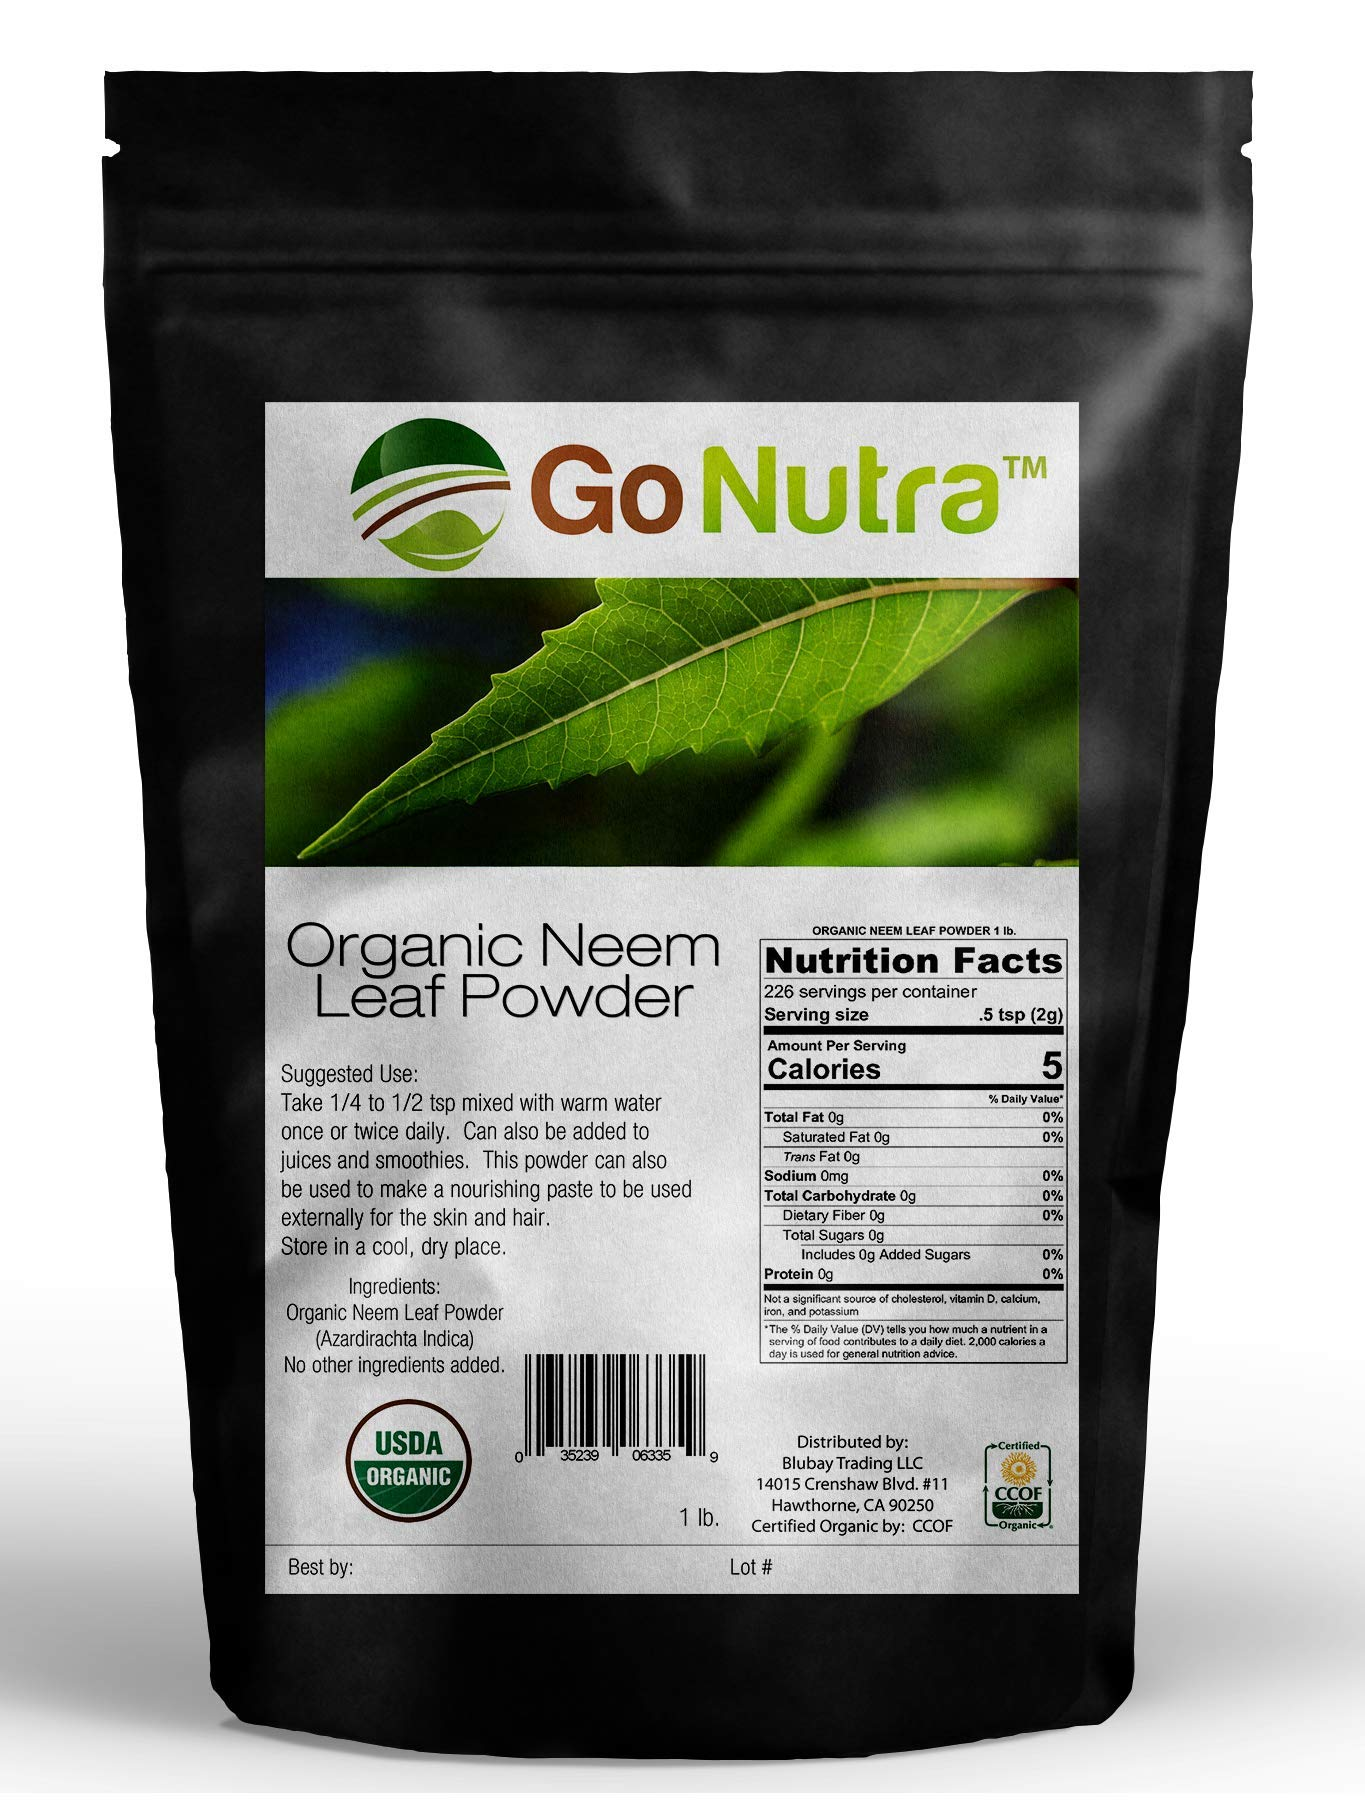 Amazing India Neem | Organic India Neem | Neem Powder 5 lb | Neem Powder for Hair Face Skin Teeth | Azadirachta Indica